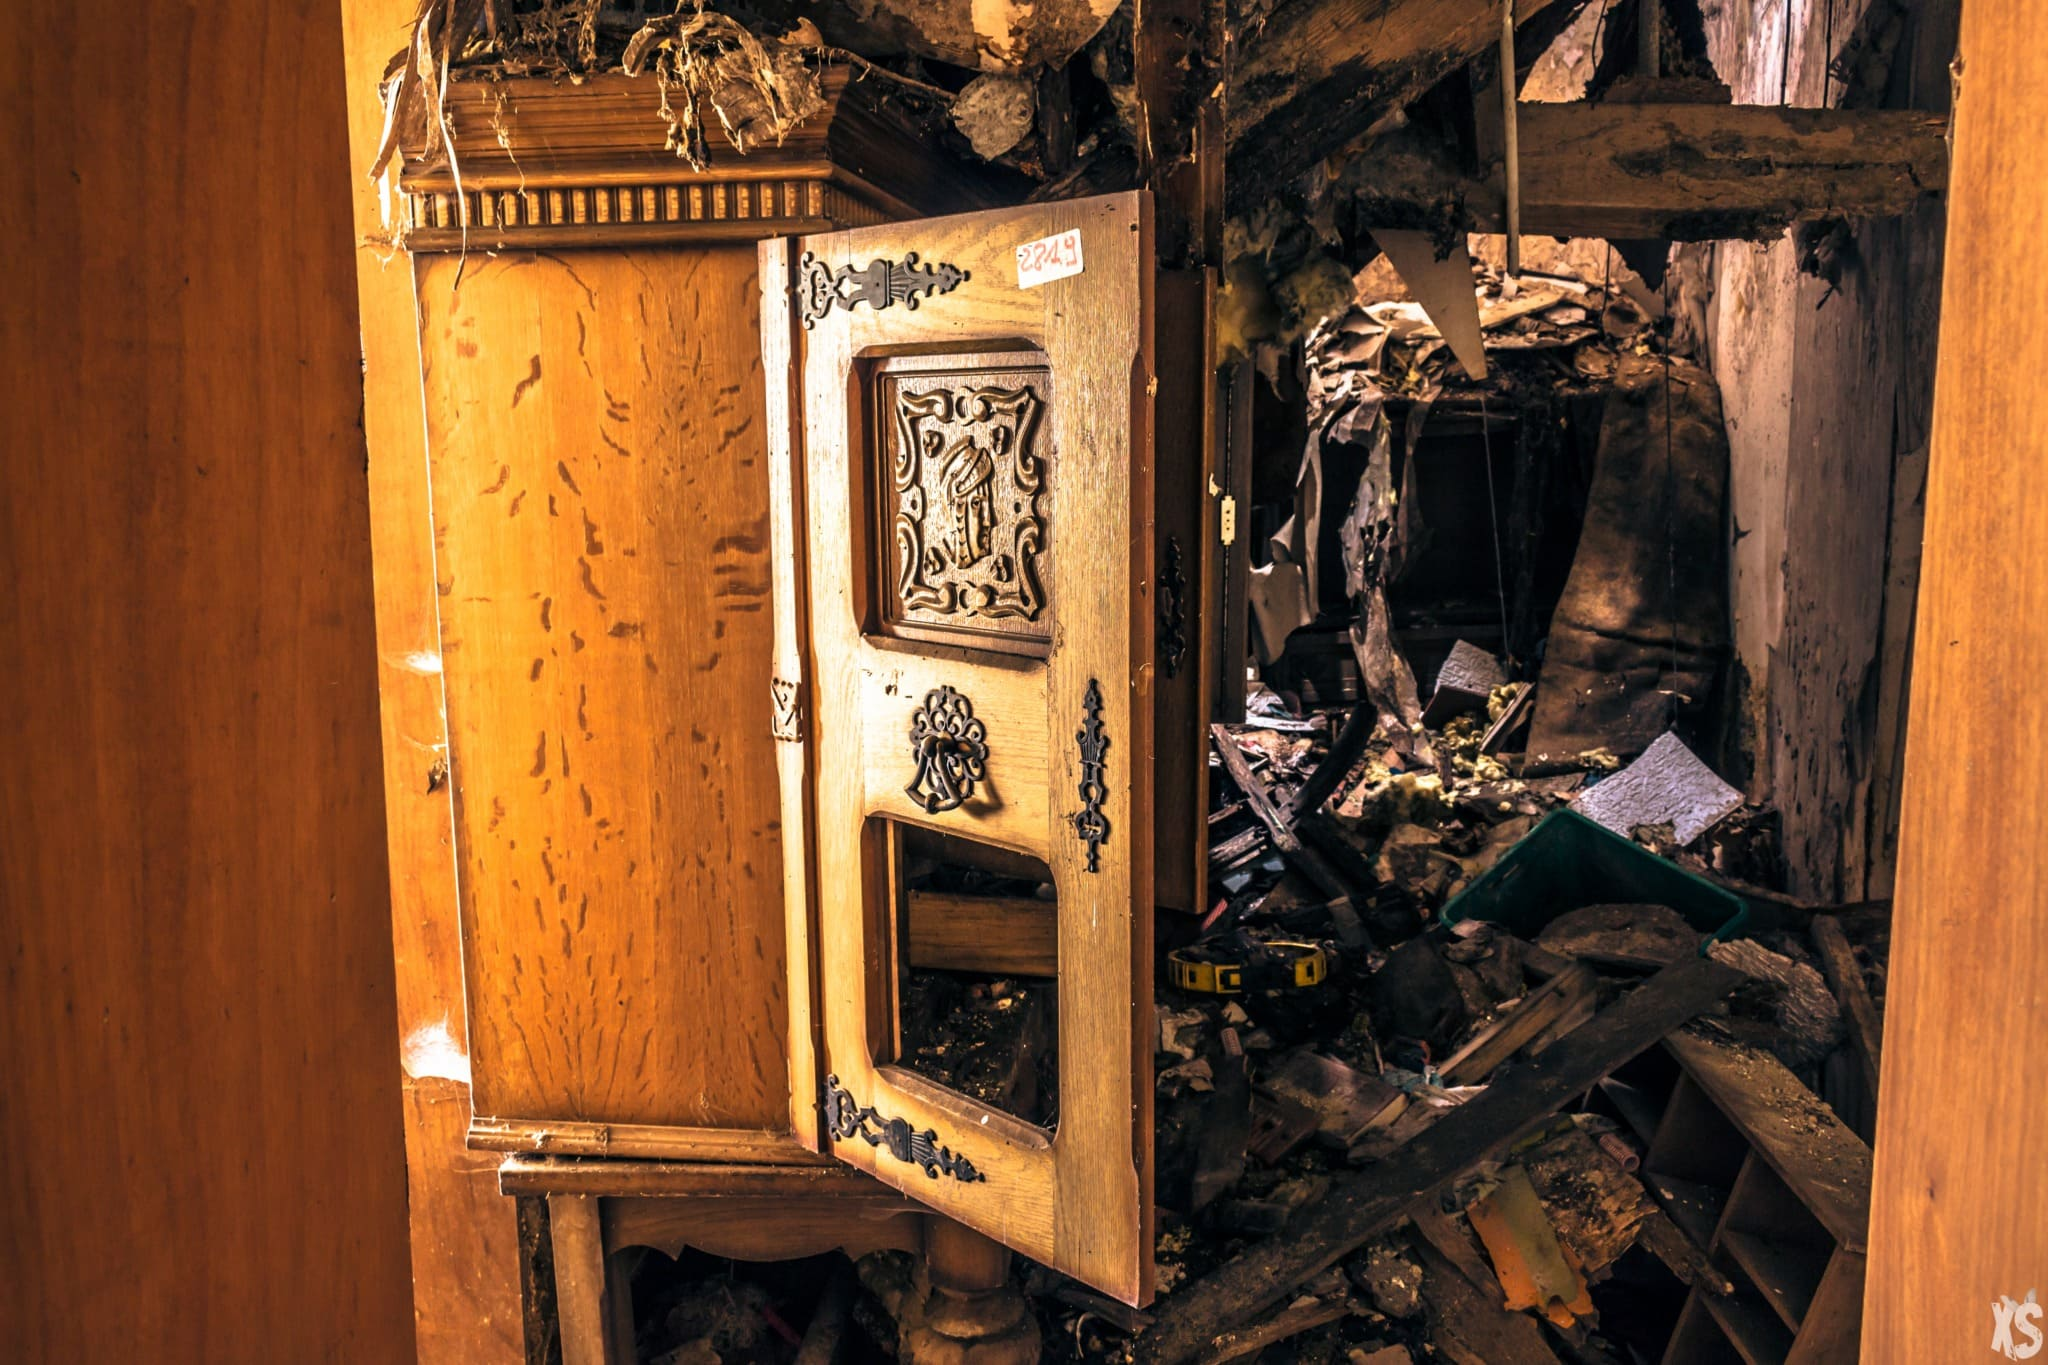 The abandoned house of Marc Dutroux | urbexsession.com/en/marc-dutroux-house | Urbex Belgium